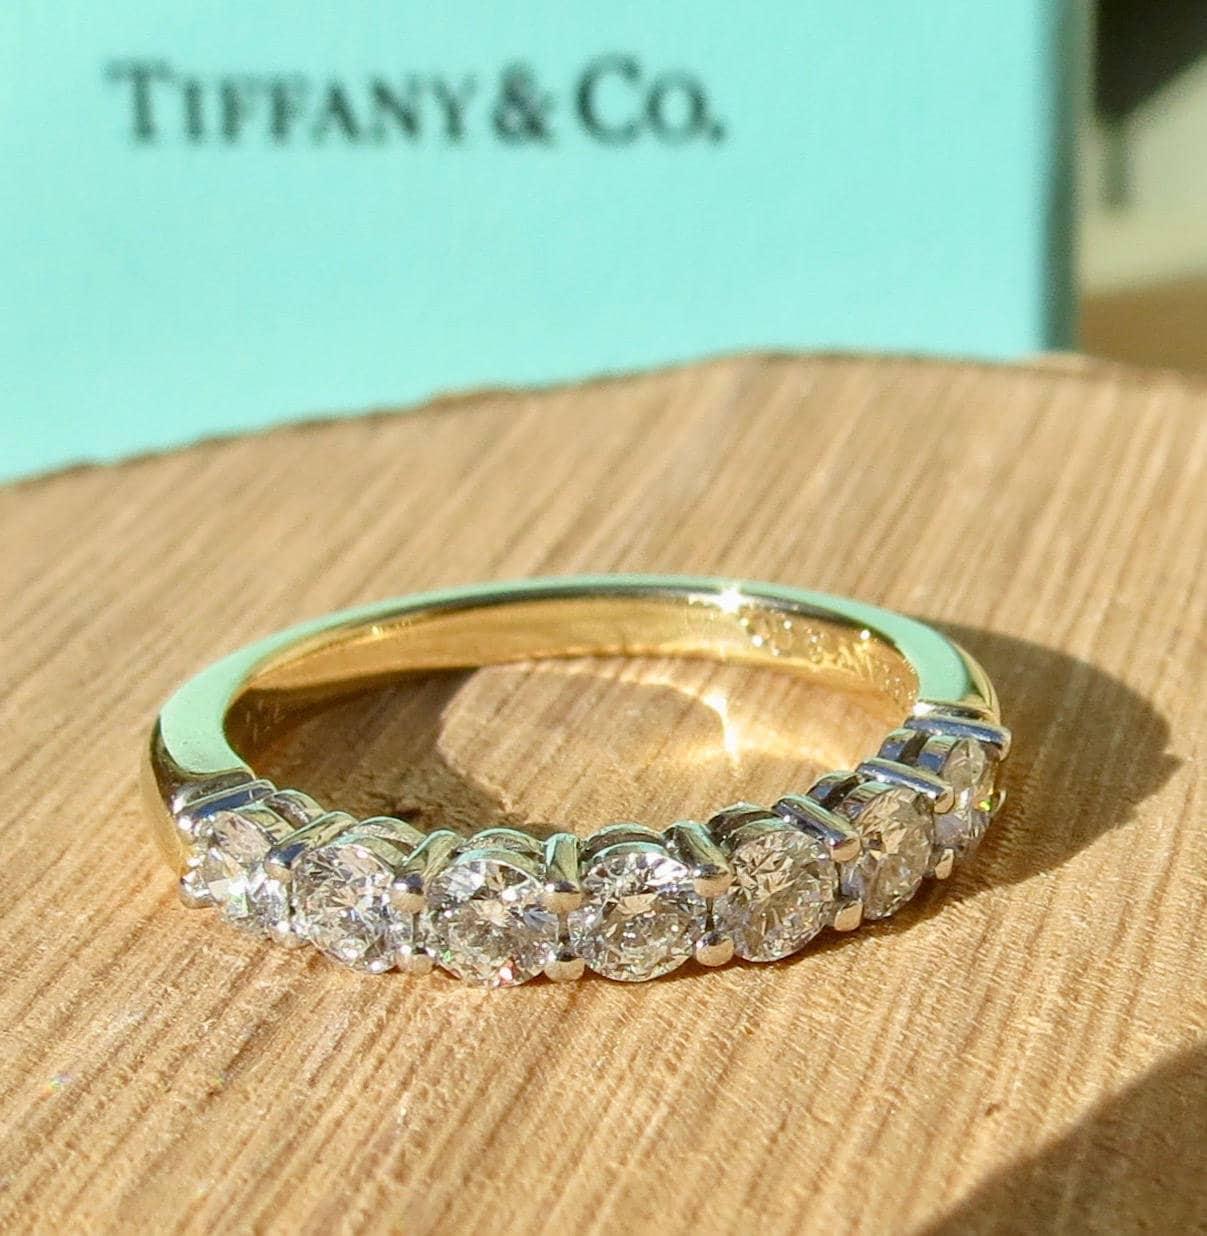 1ebee7835 Tiffany & Co 18k and Platinum 7 stone 3/4 carat diamond ring. Free ...